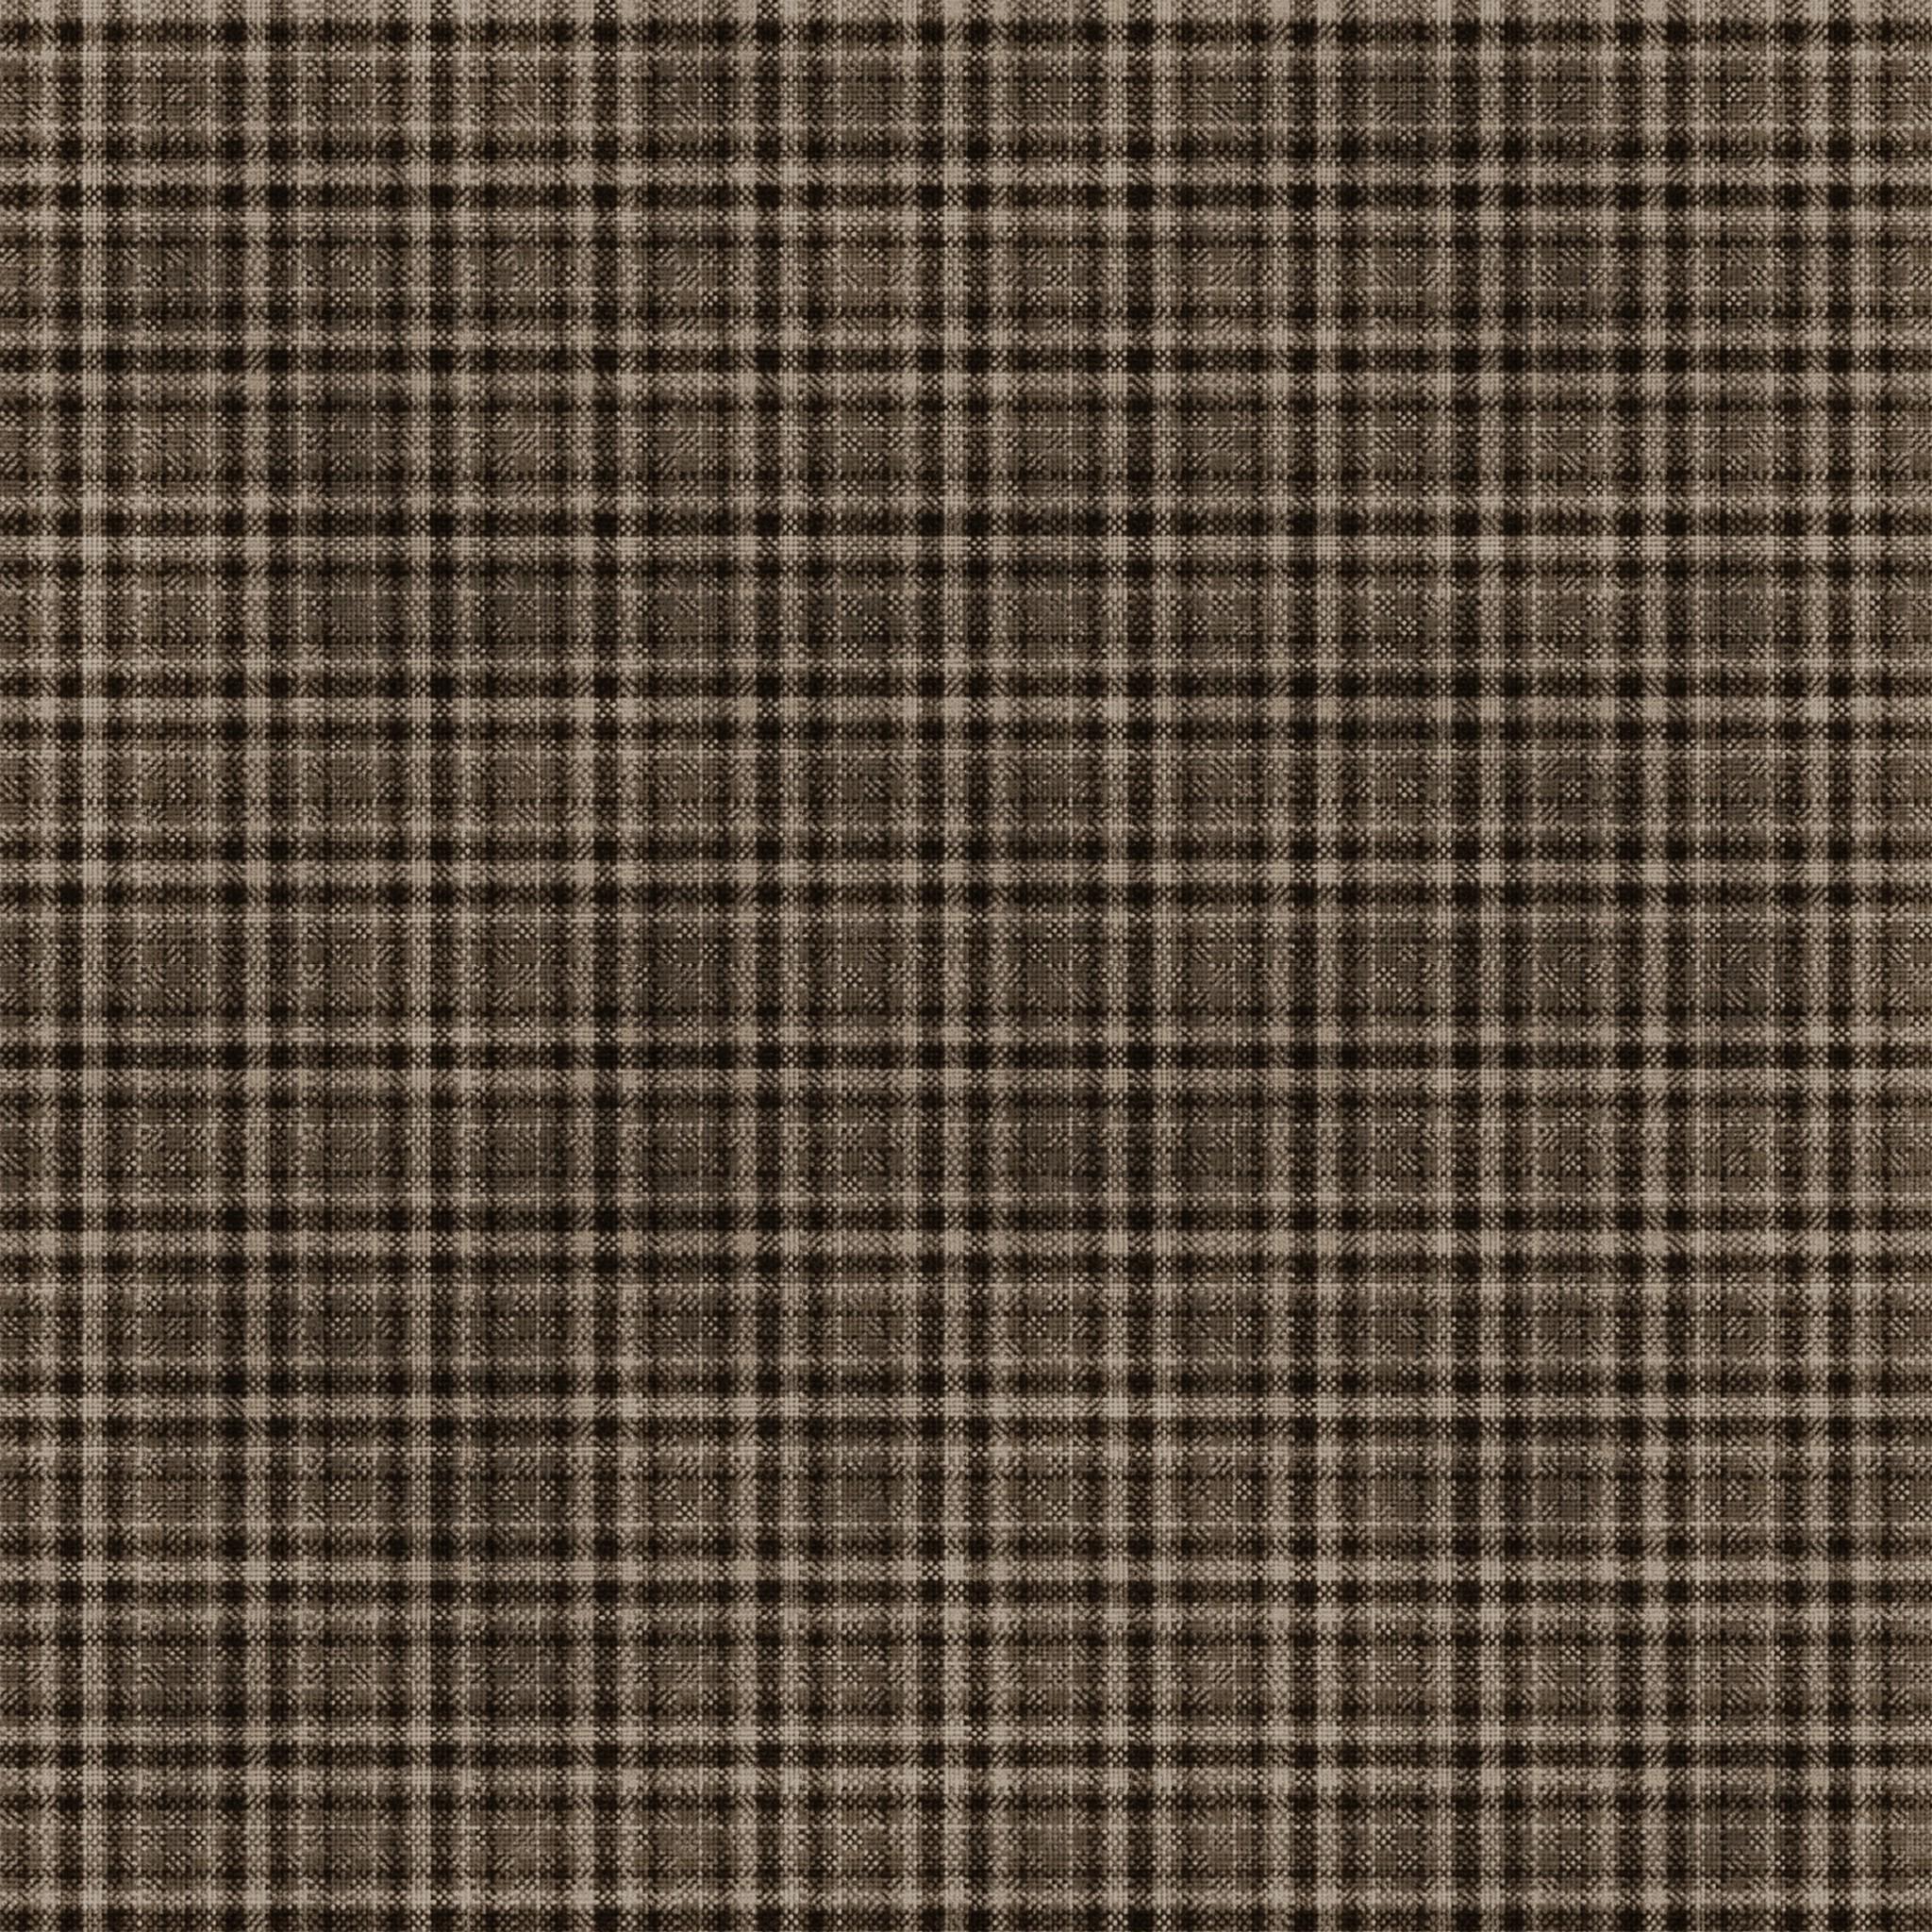 Текстуры Ткани Для Дивана